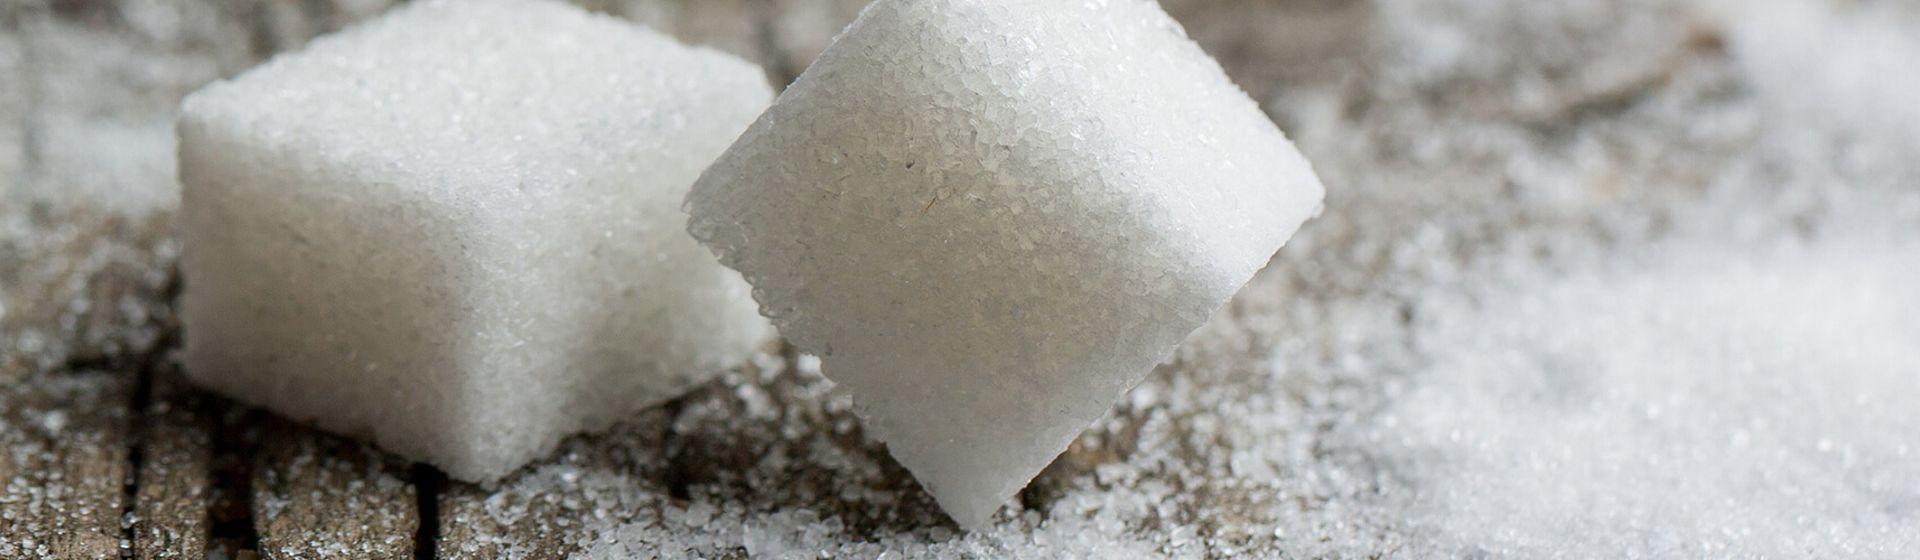 cukor datovania NYC